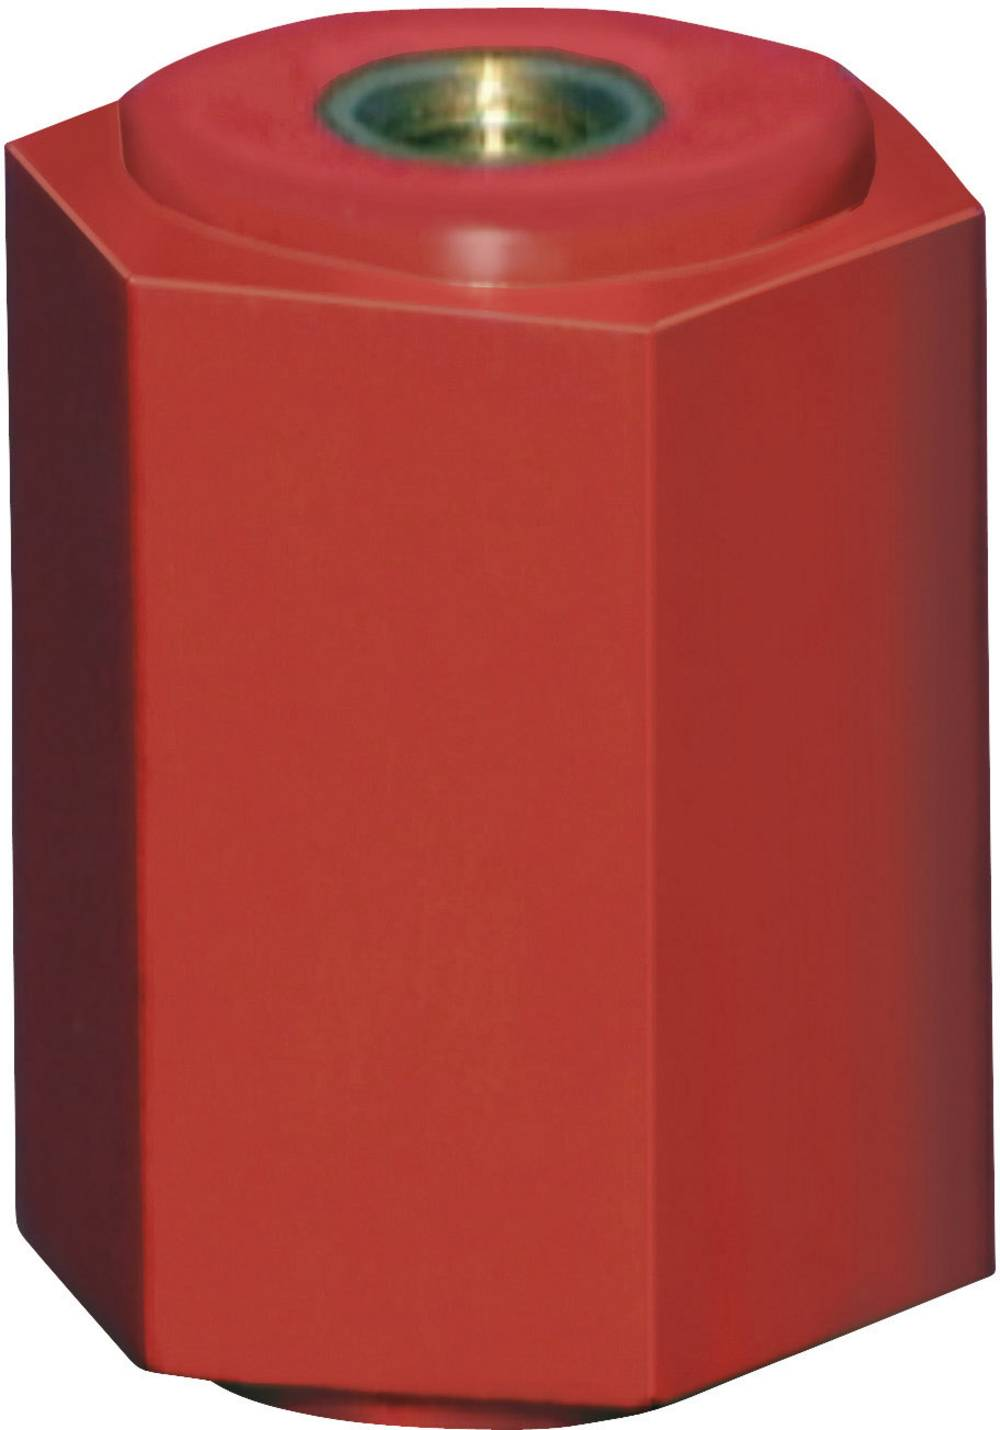 Ĺ estrubi izolacijski potpornikSW35, 30 mm, poliester, ojačan IS35HH830